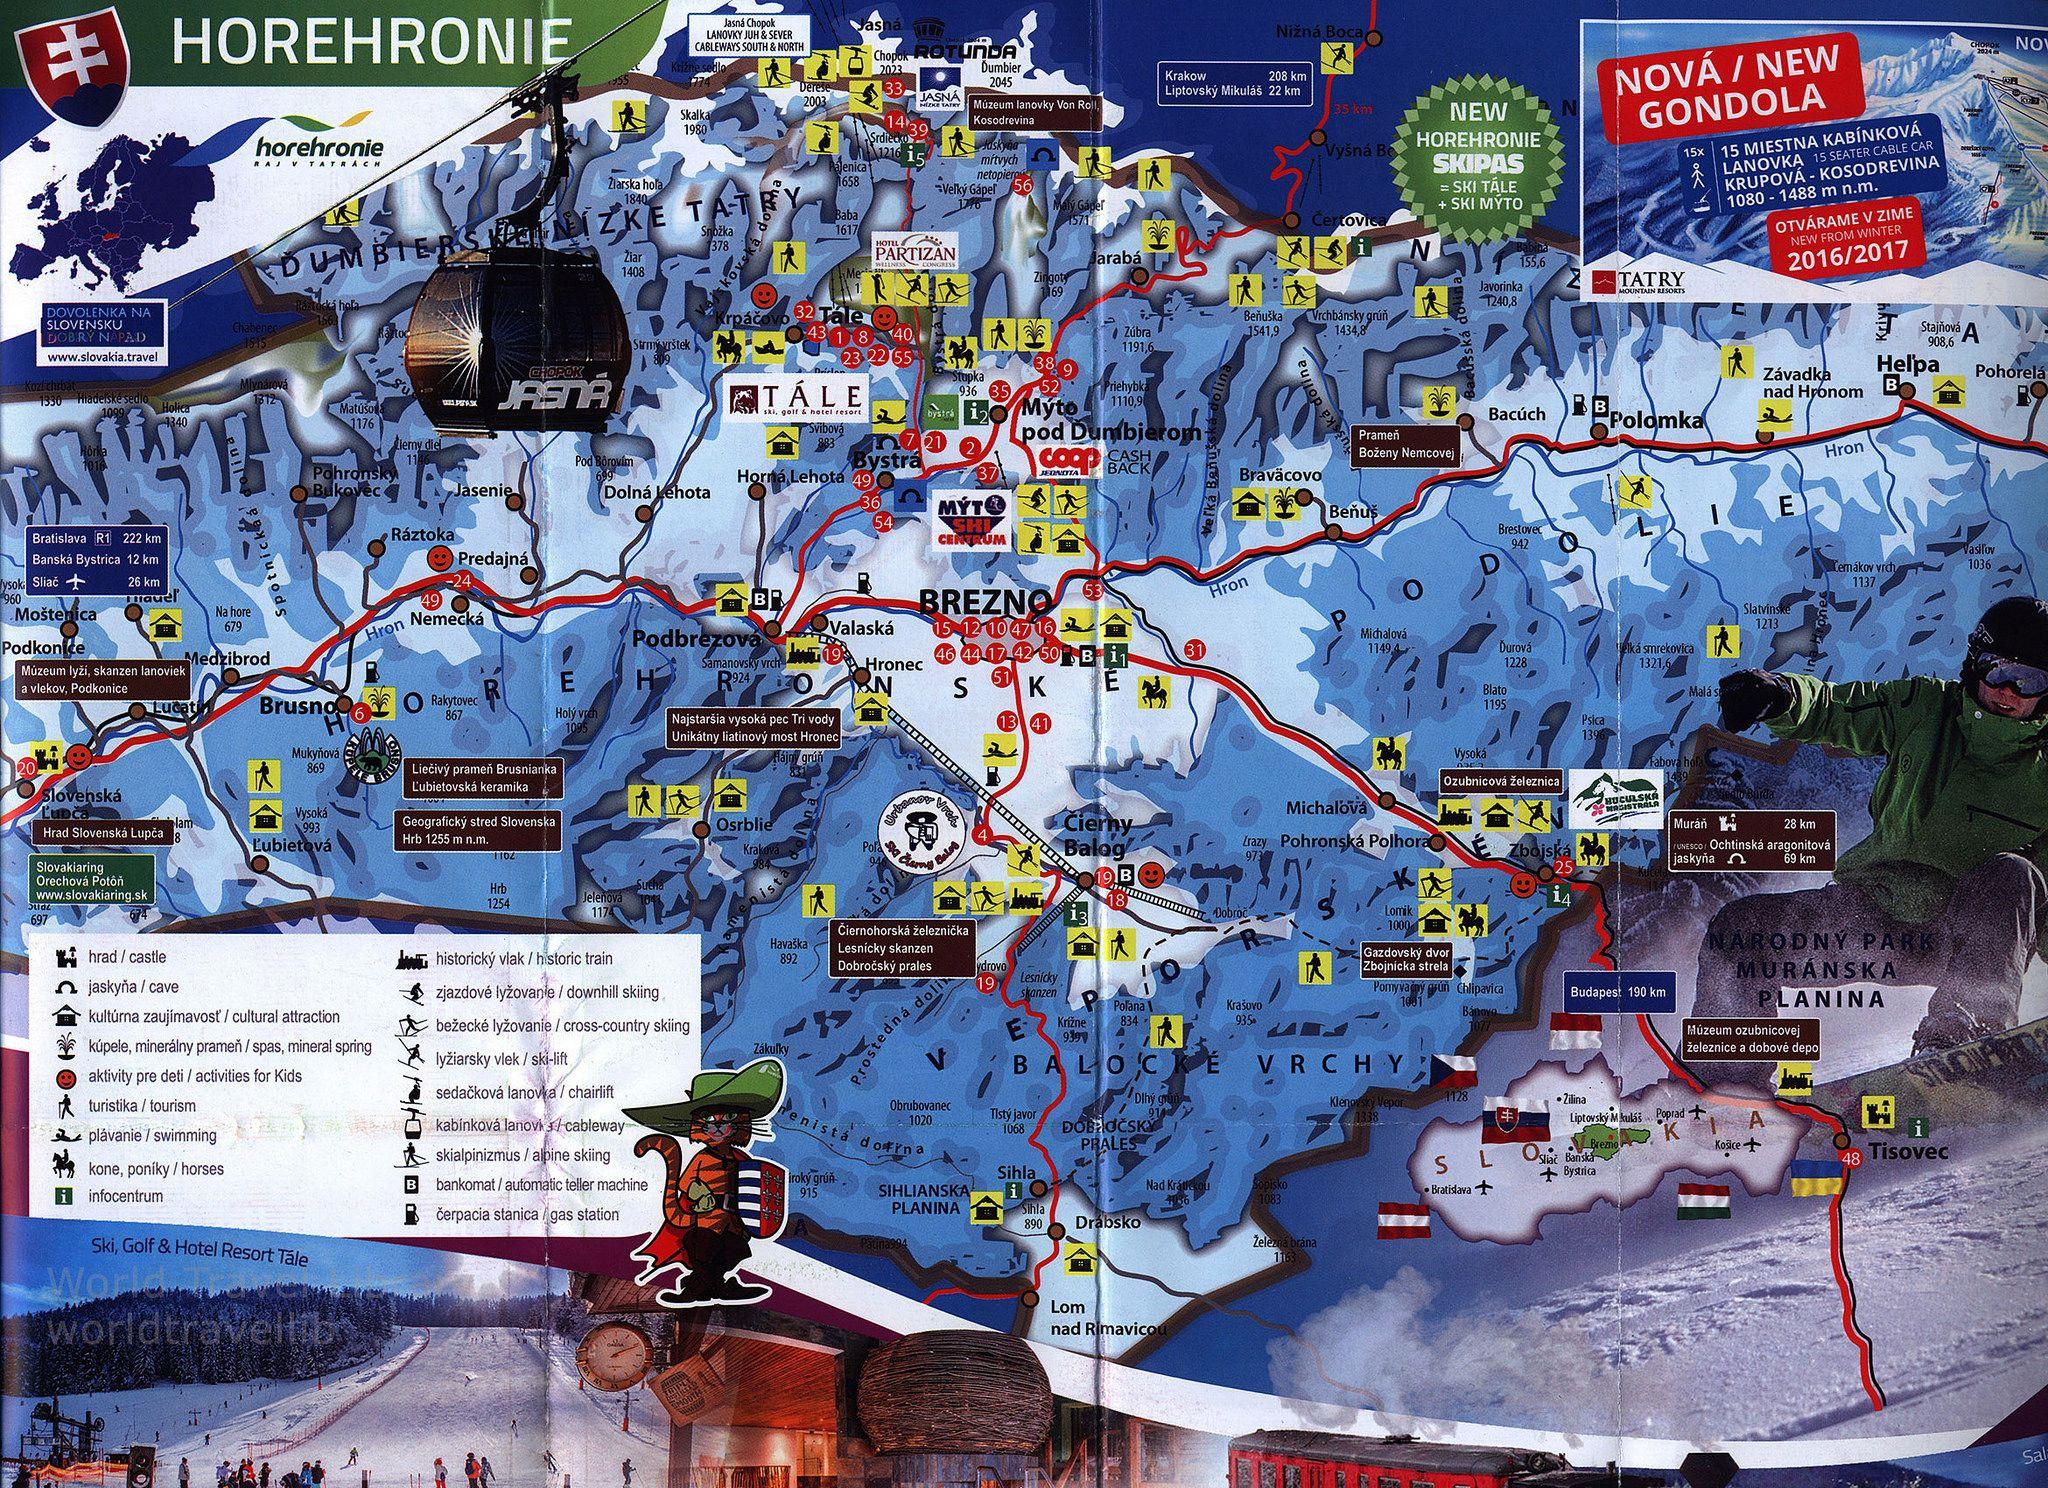 httpsflickrpUNuf2e Region Horehronie Slovakia Mapa